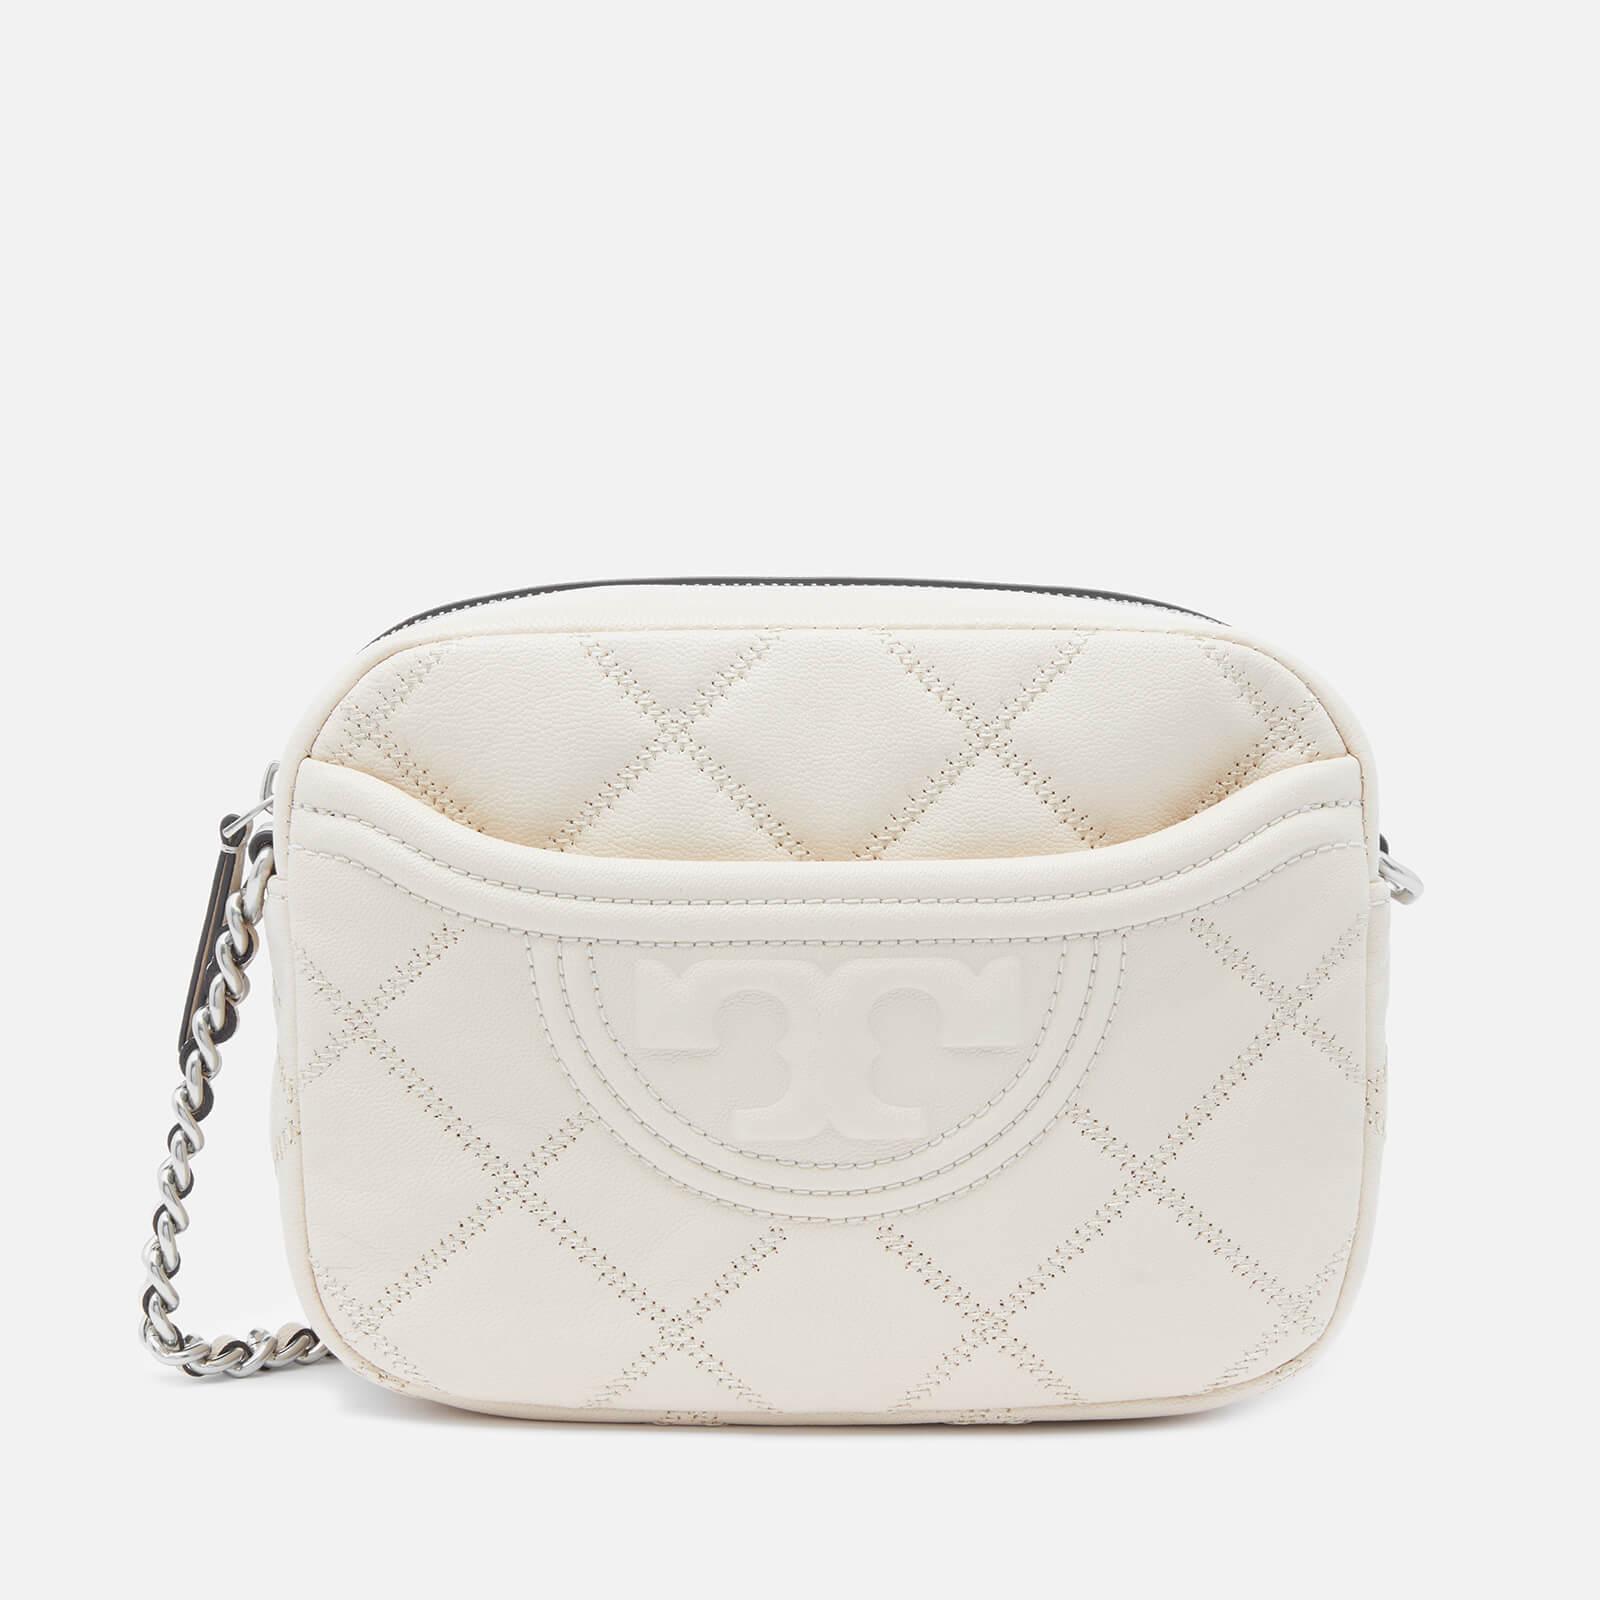 Tory Burch Women's Fleming Soft Textured Camera Bag - New Cream